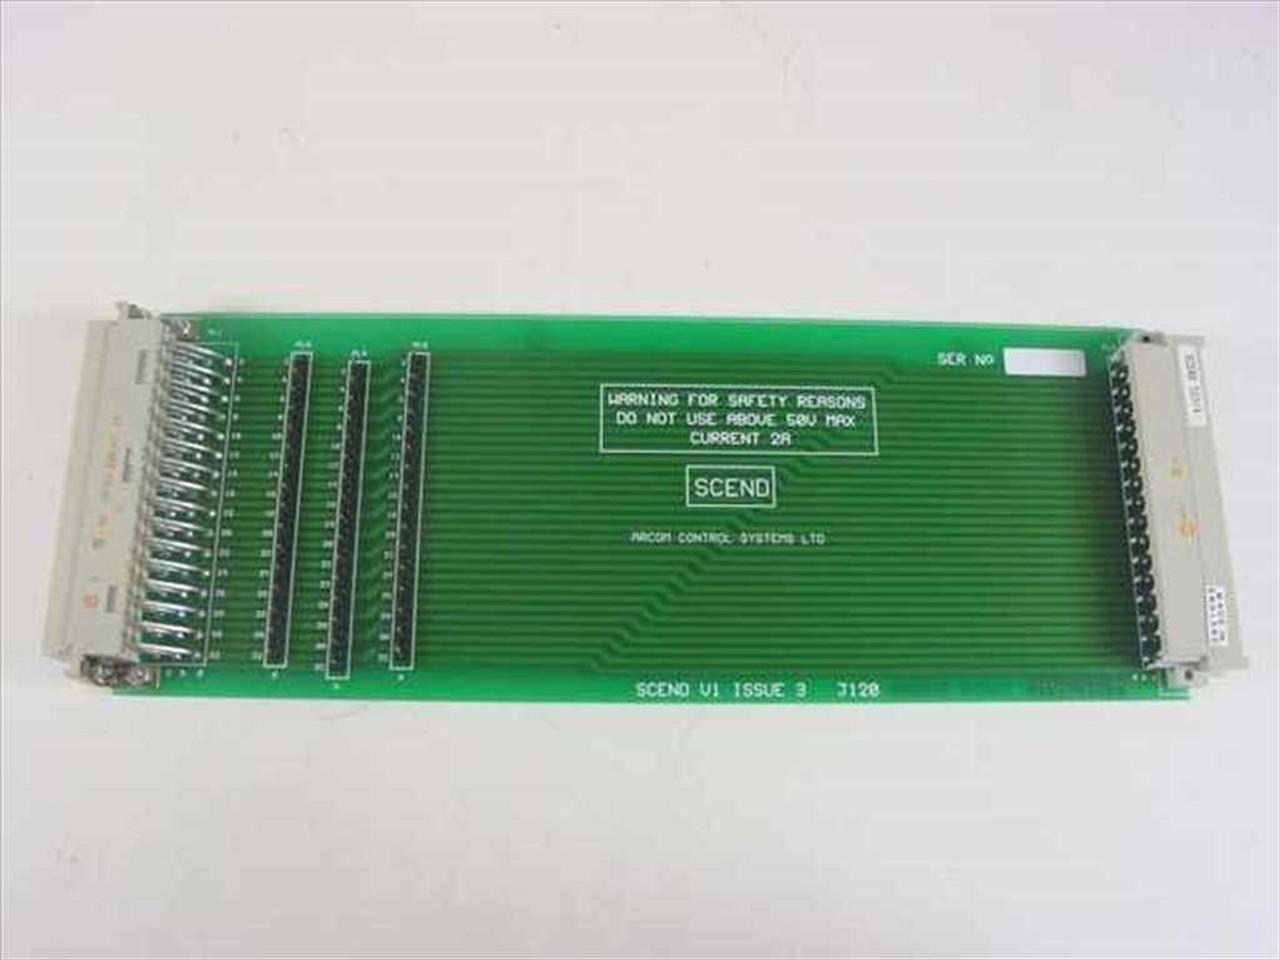 ZSPIBB Arcom Control Systems SPIBB 40-Channel Parallel I//O Interface